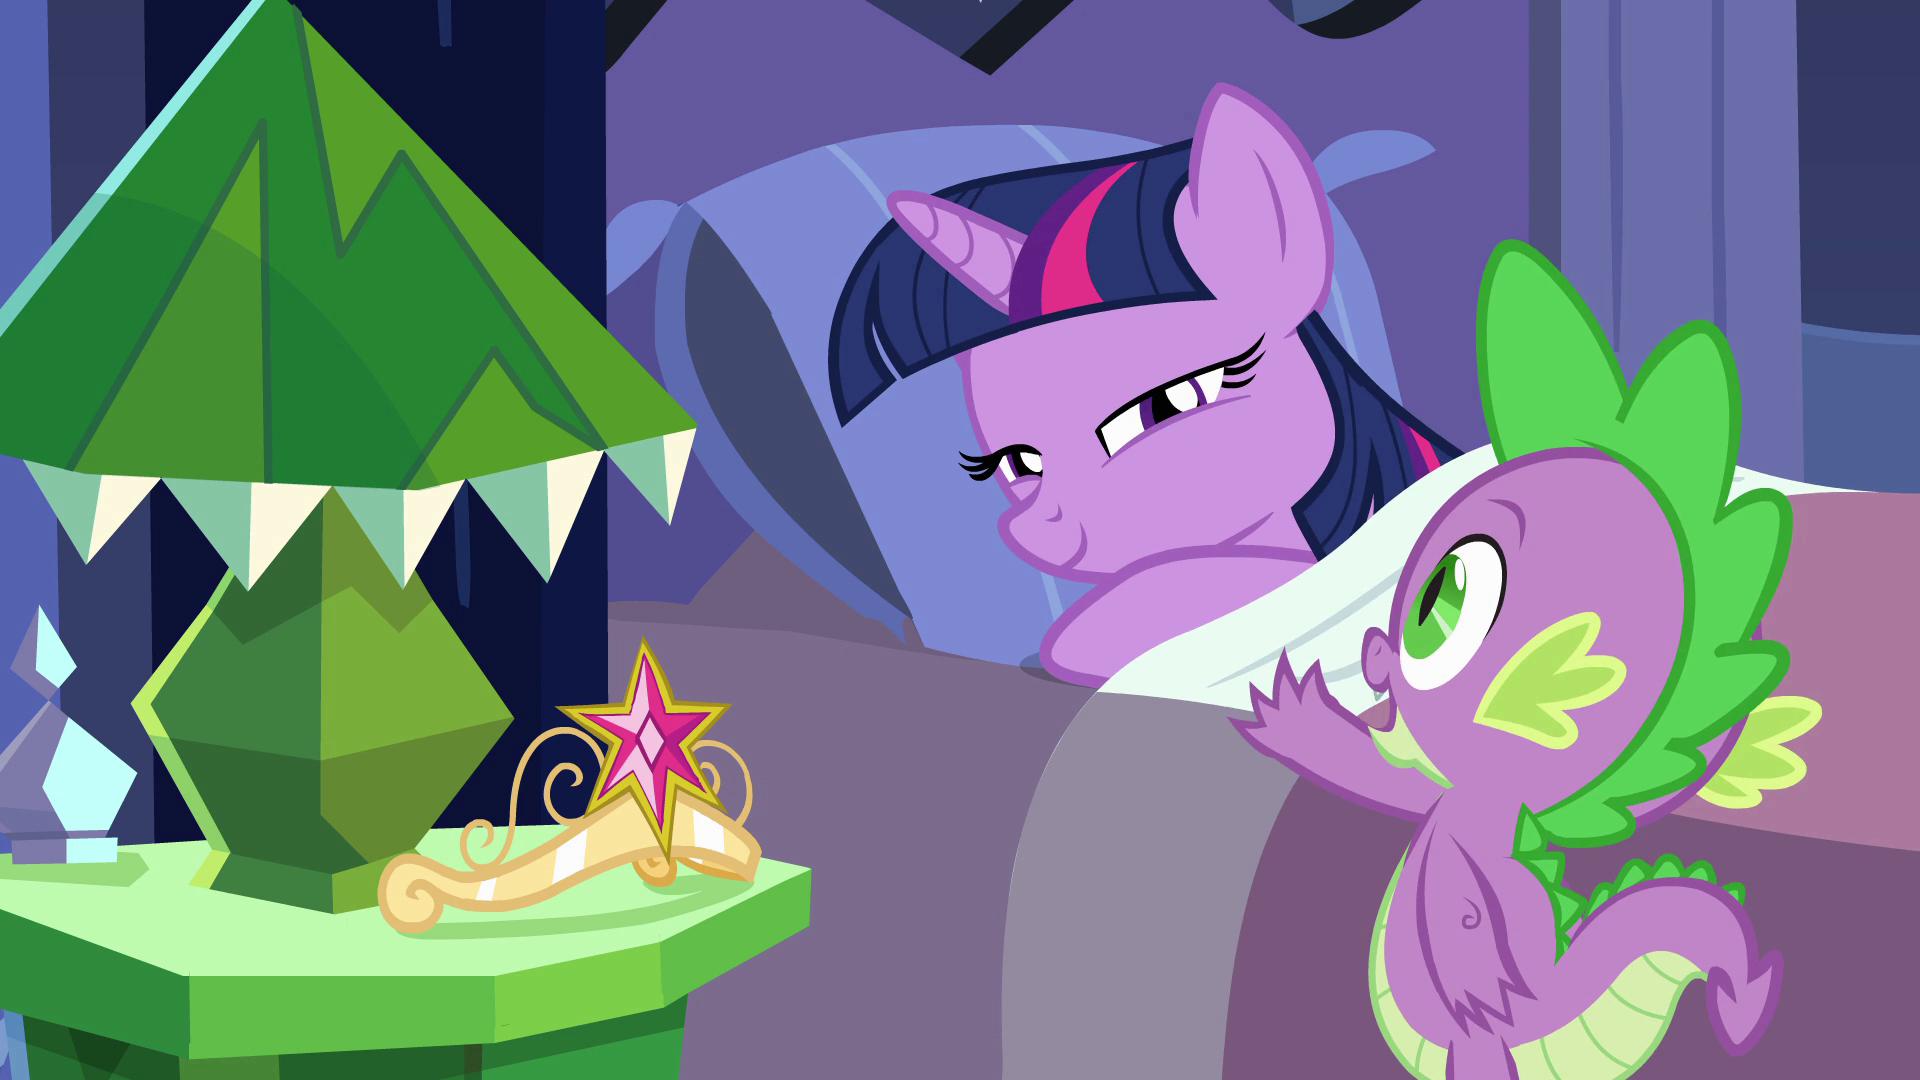 SpikeGalleryEquestria Girls  My Little Pony Friendship is Magic